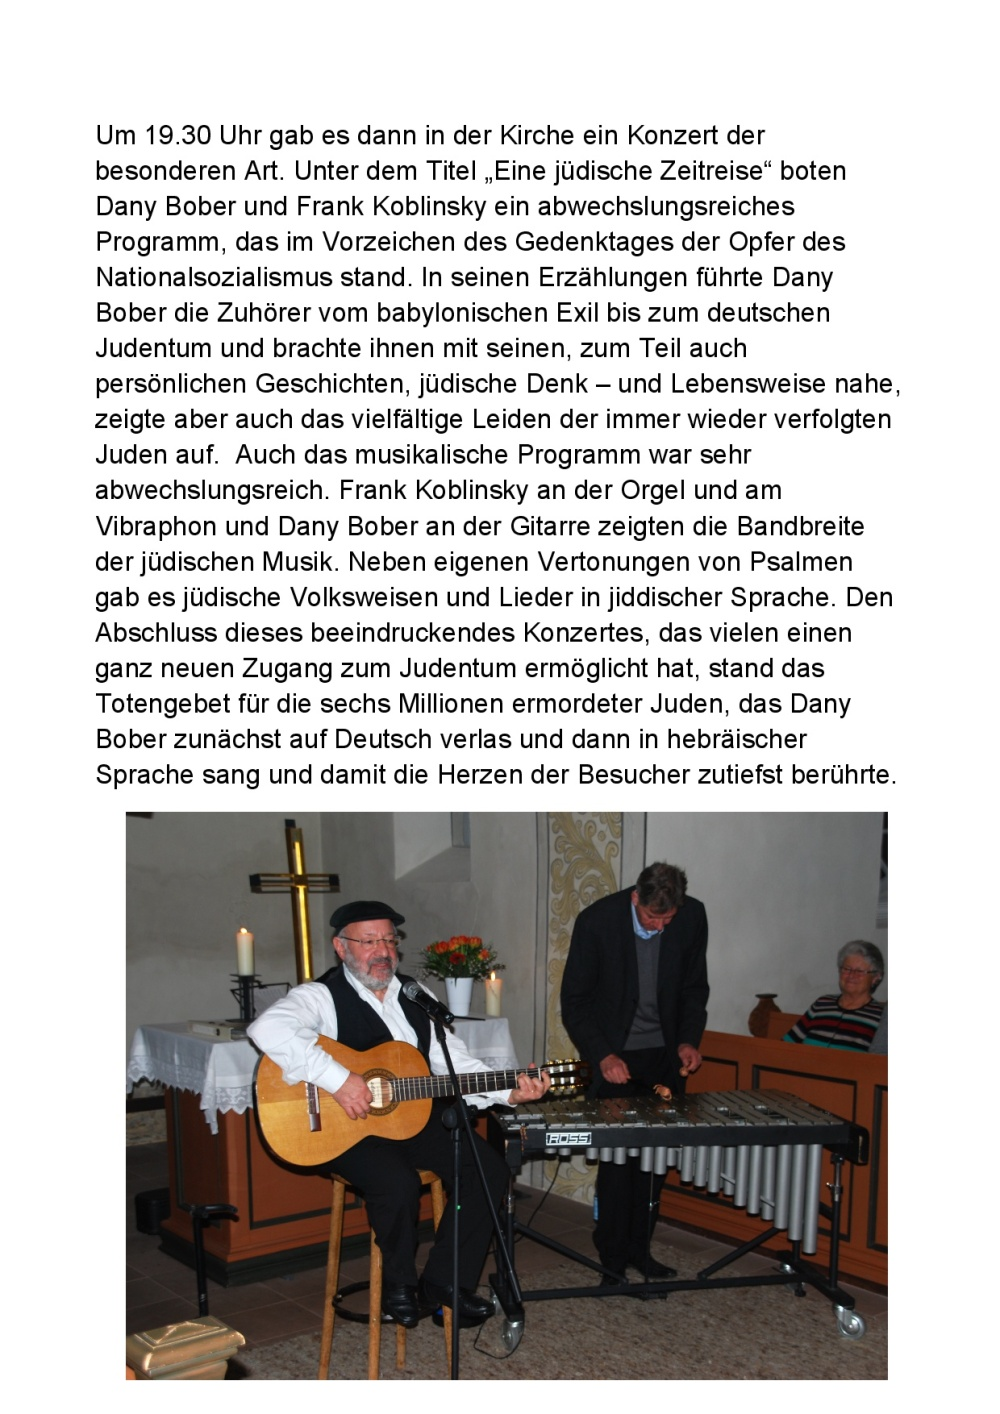 03-Godi Neujahrsempfang +Konzert 26.01.14-002